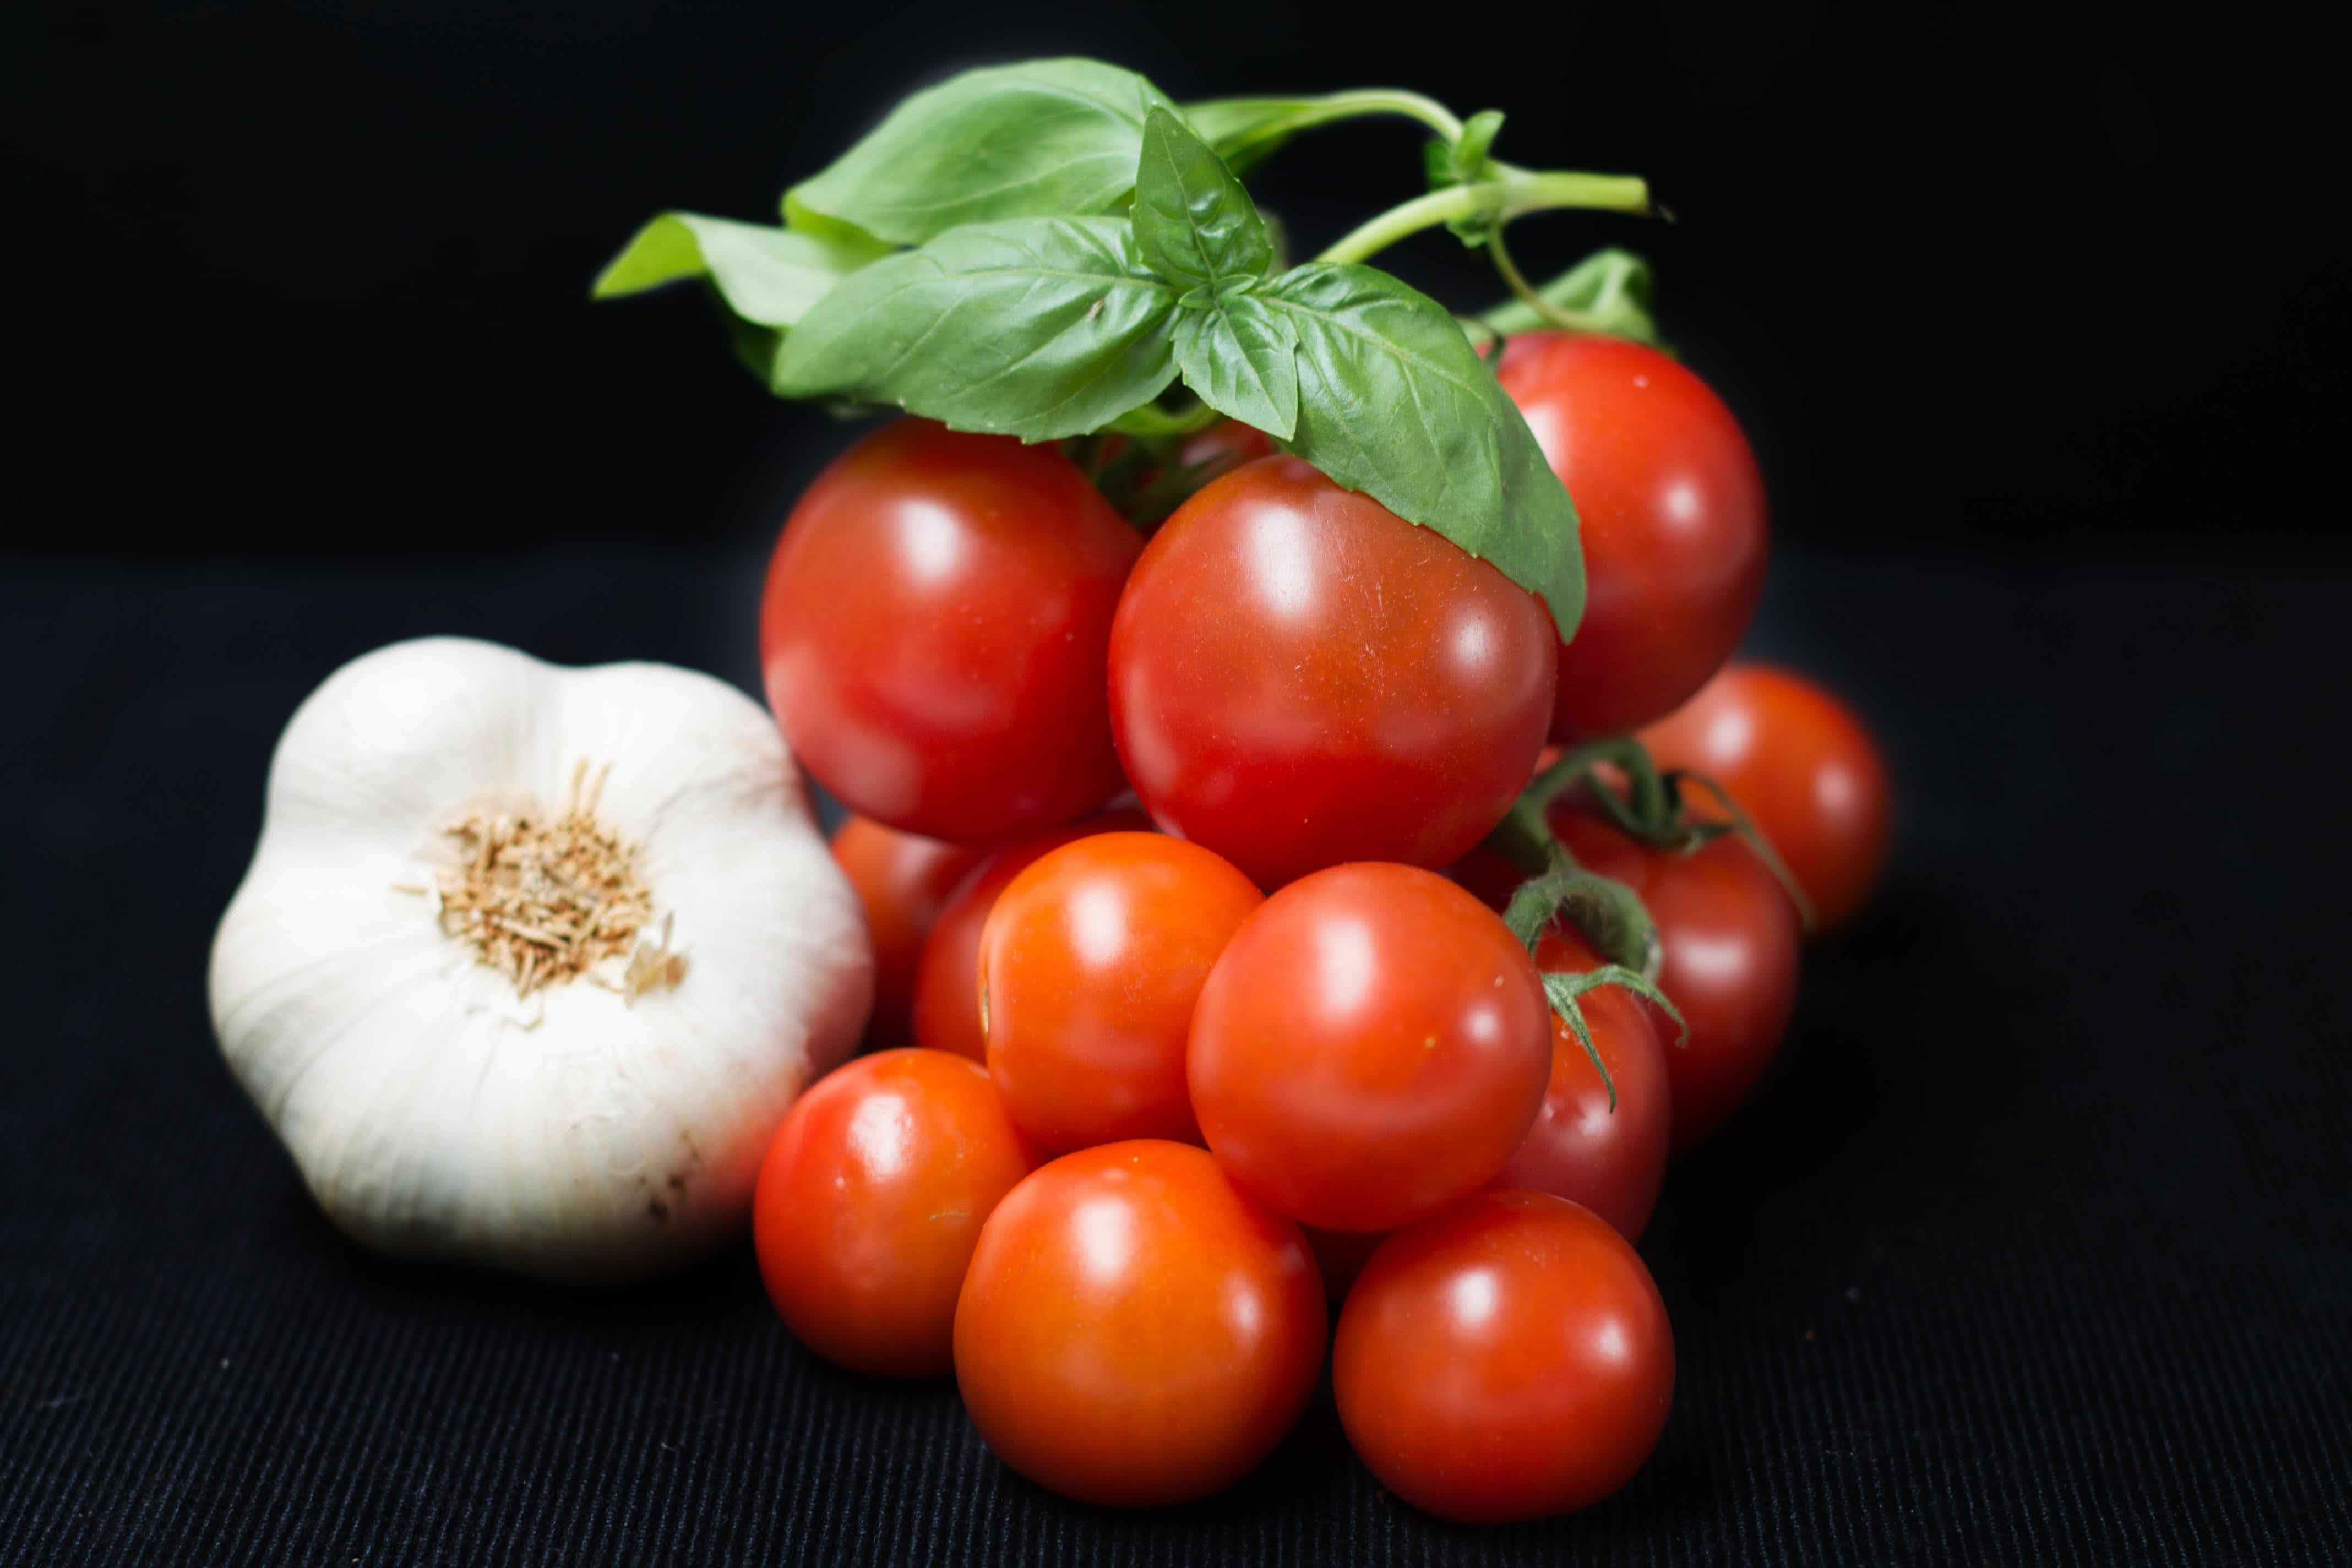 garlic bulb, cherry tomatoes and basil